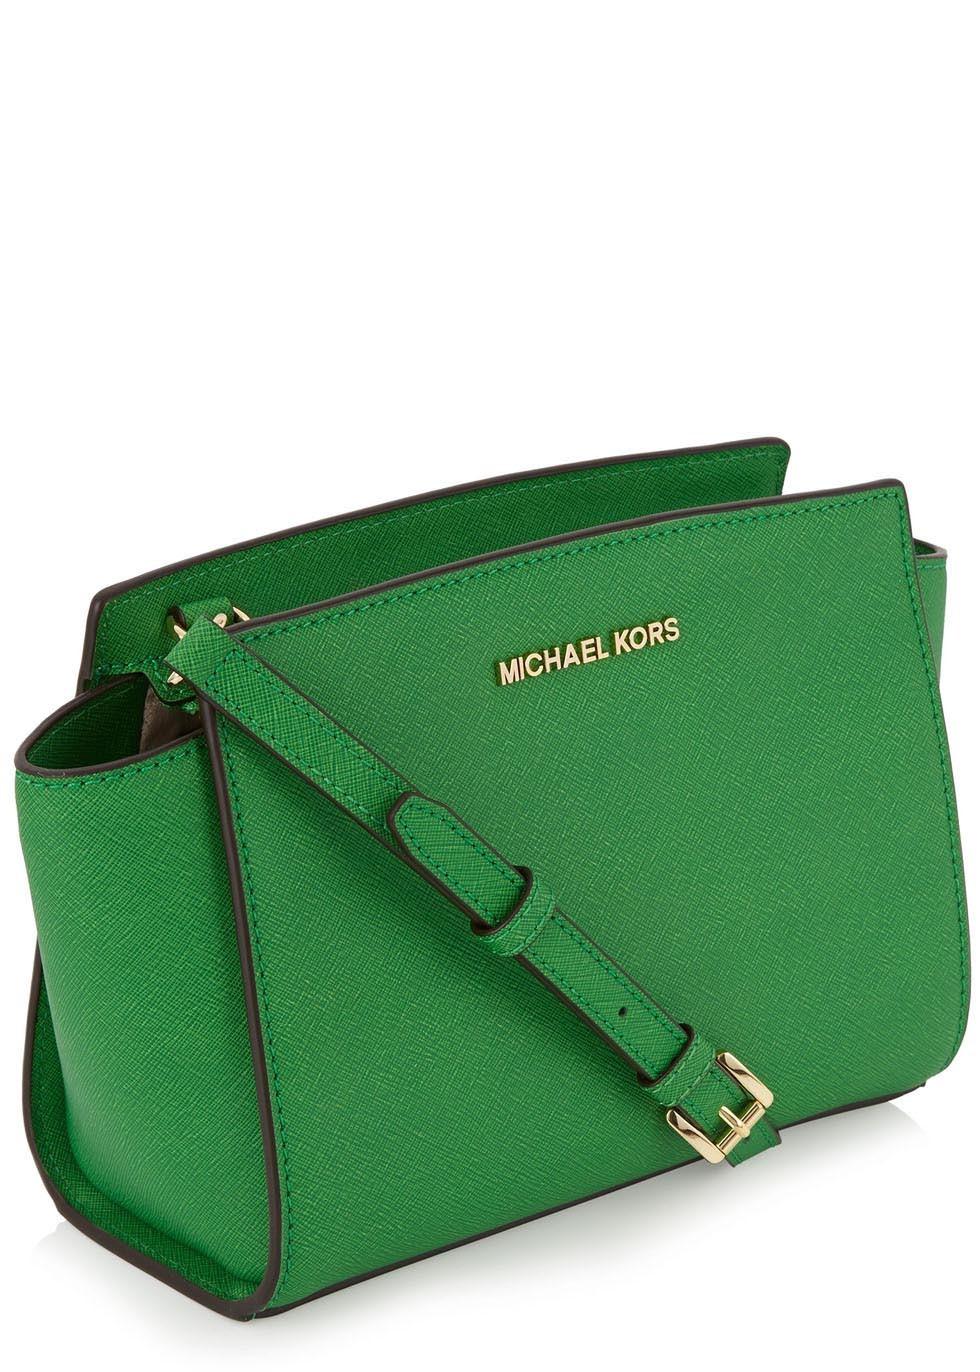 c787d77b8b08 ... norway michael kors selma green saffiano crossbody bag in green lyst  bfed5 f2513